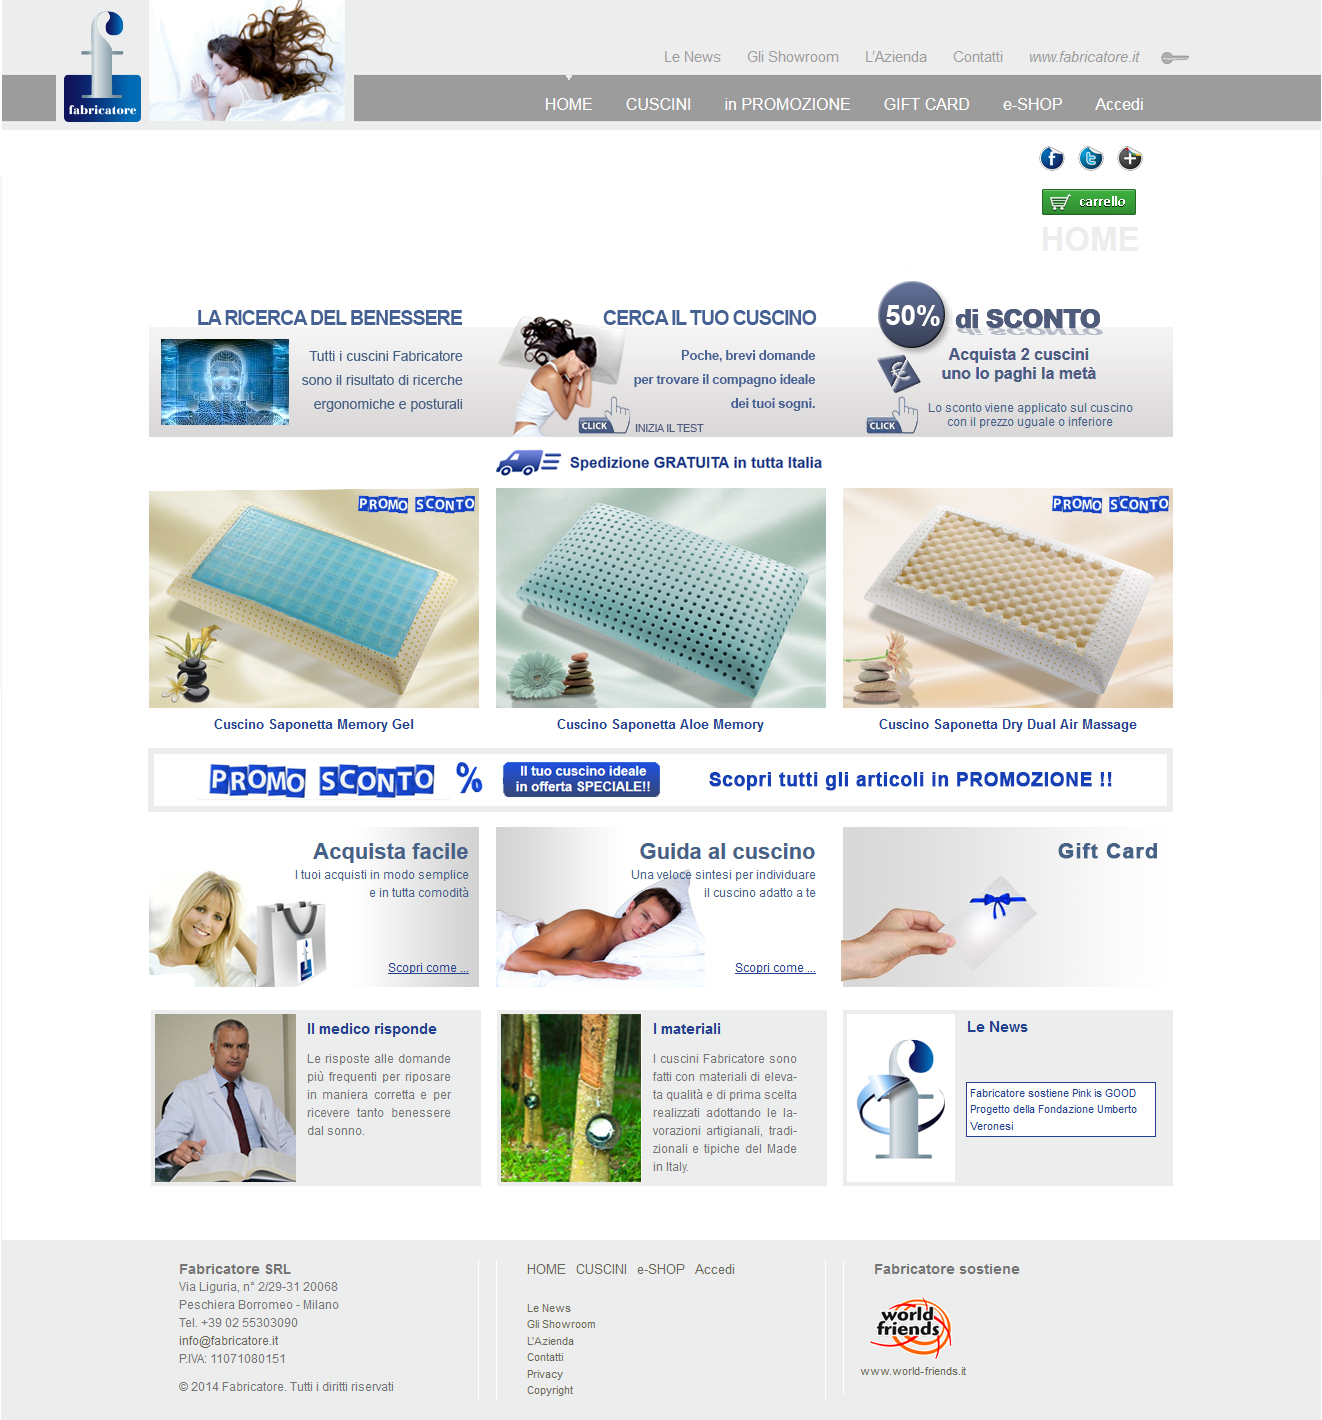 Fabricatore Cuscini.Web E Multimedia Totti Totti